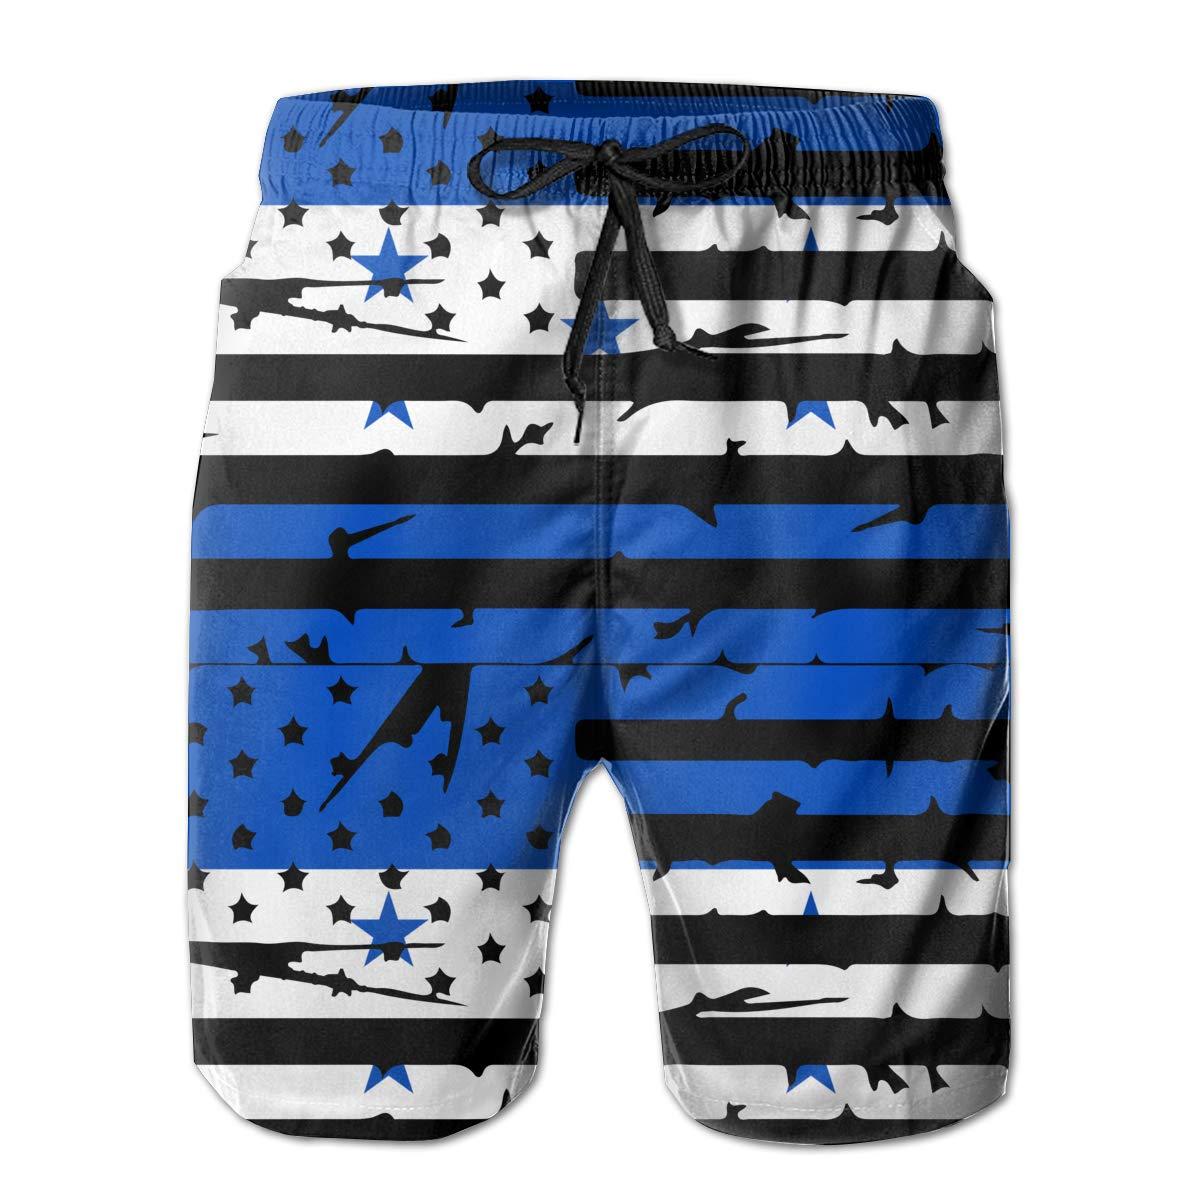 STDKNSK9 Mens Honduras American Flag Boardshorts Beach Pants